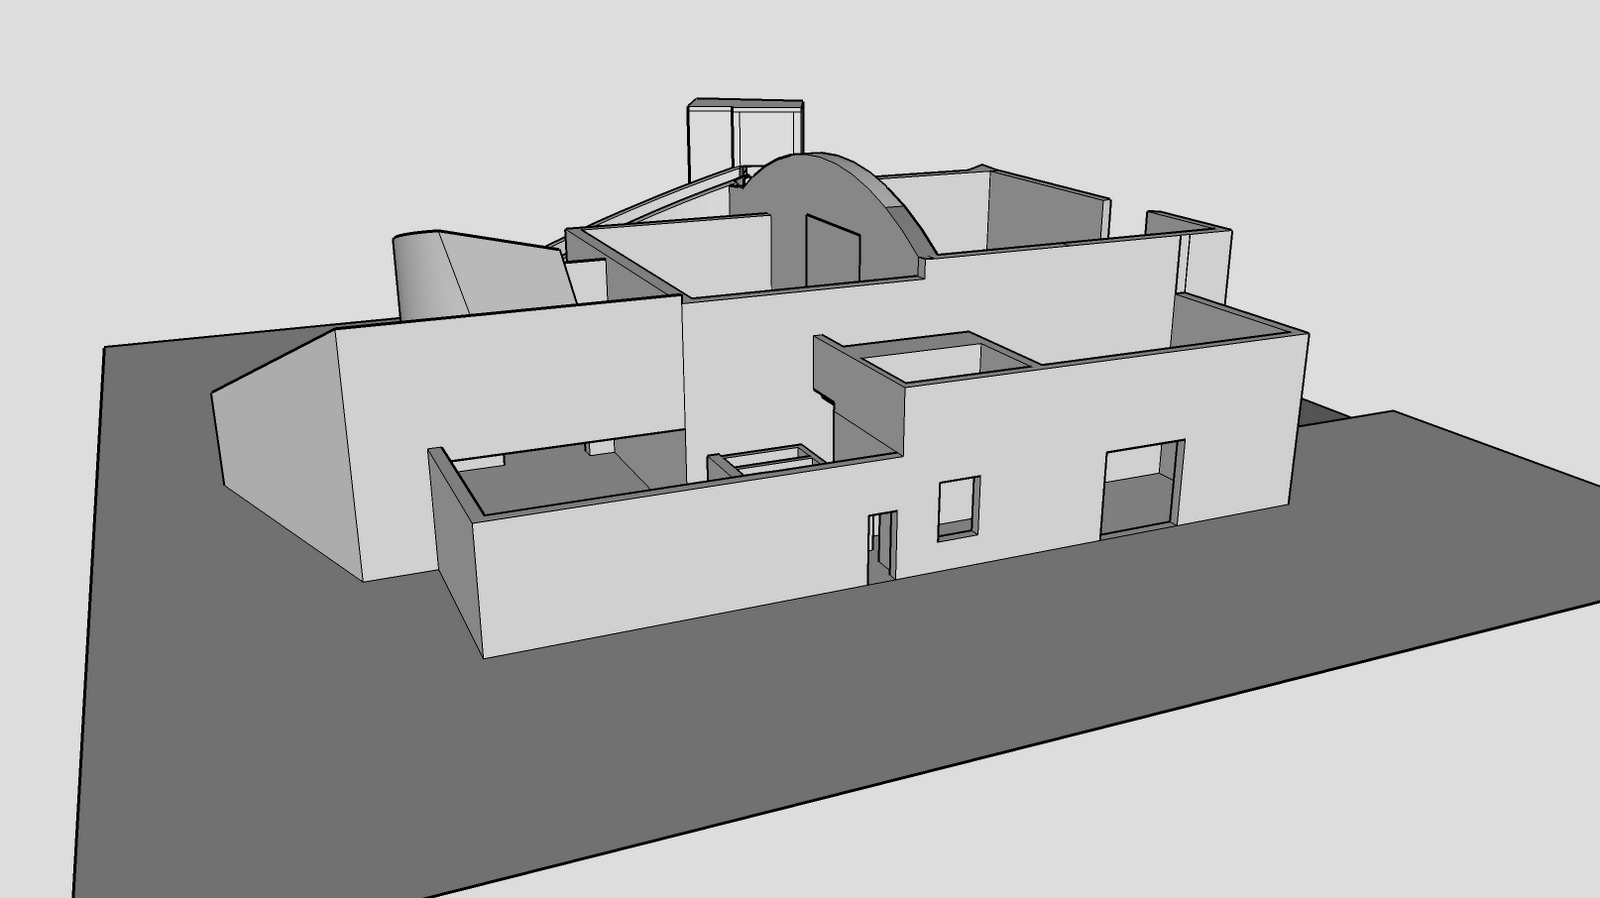 jeremiasz sieczko arch1390 week 9 vitra design museum. Black Bedroom Furniture Sets. Home Design Ideas